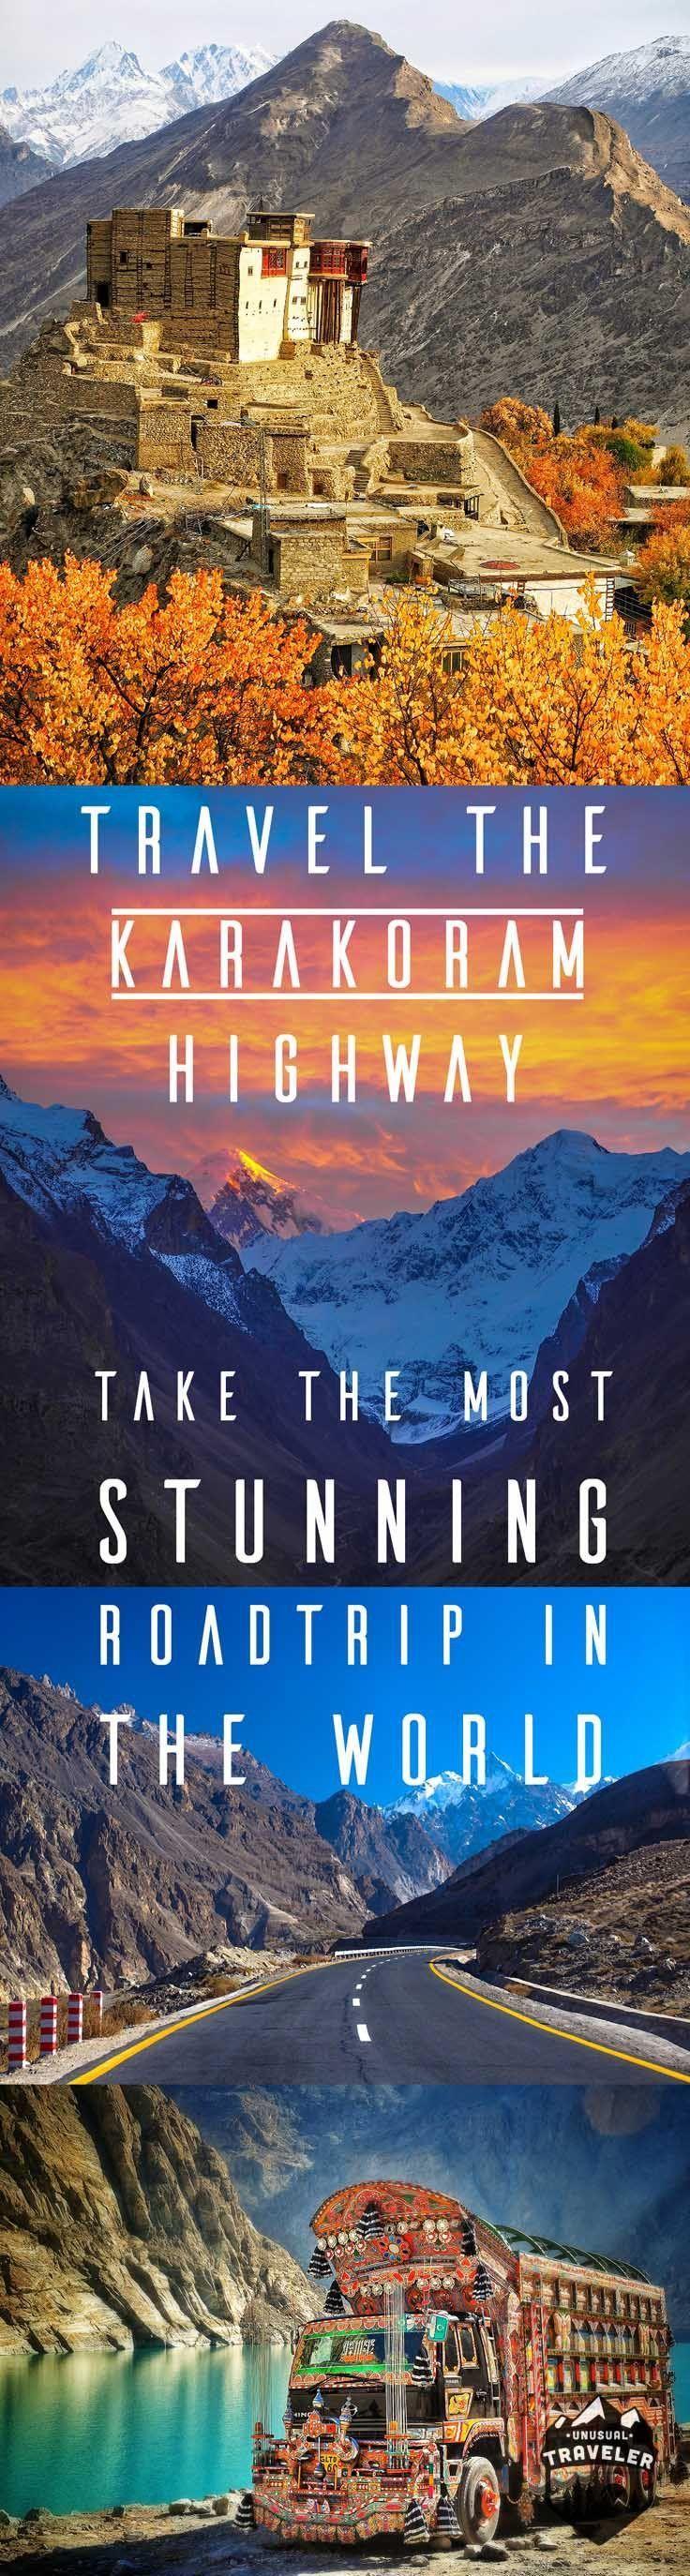 Travel the Karakoram Highway in Pakistan, the worlds most stunning Road trip...#Pakistan #travel_tips #Karakoram